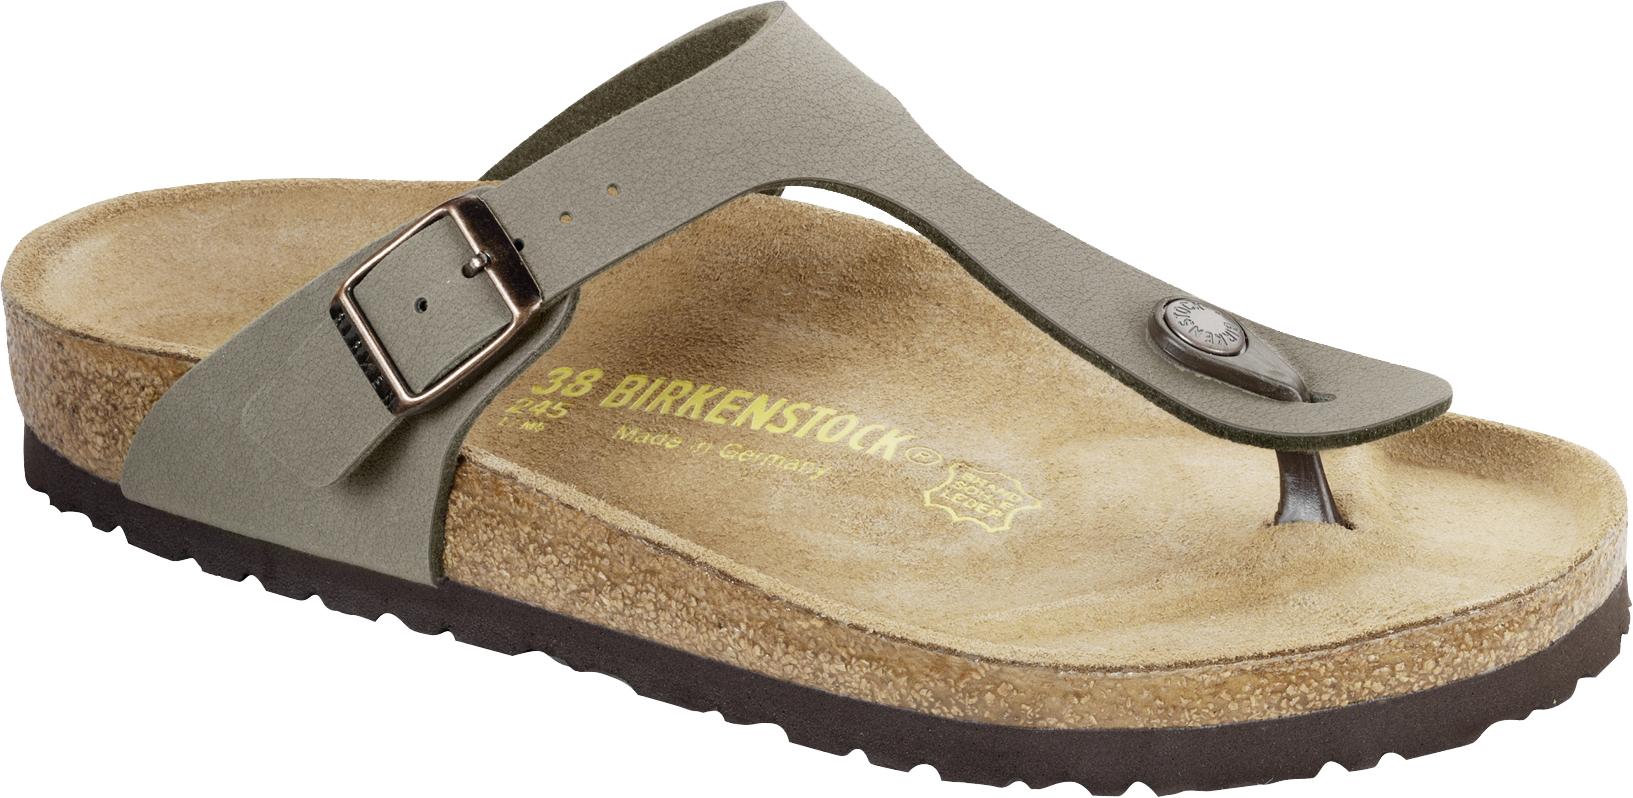 Birkenstock Gizeh Sandals - Women s d3812c7a8d2